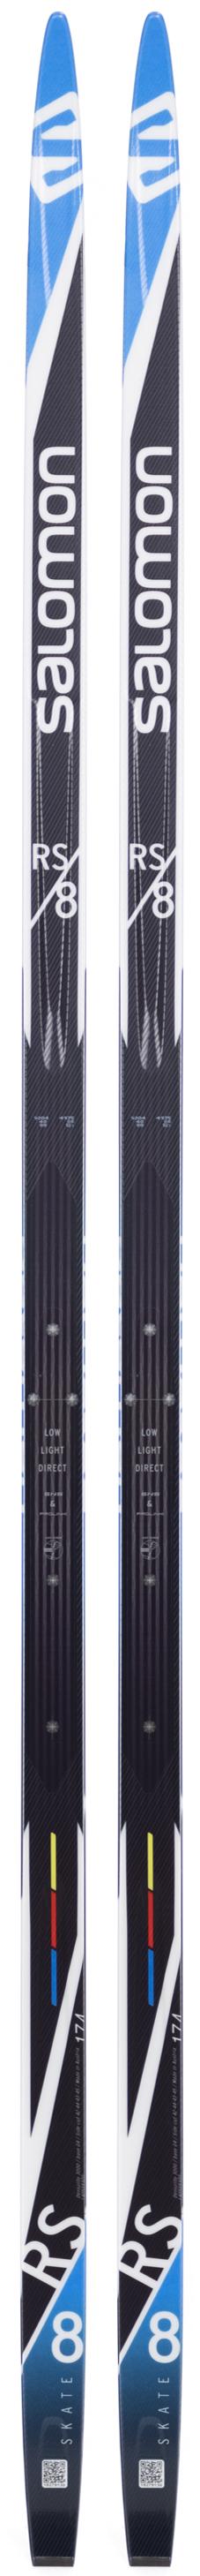 Salomon Беговые лыжи Salomon RS 8 цена